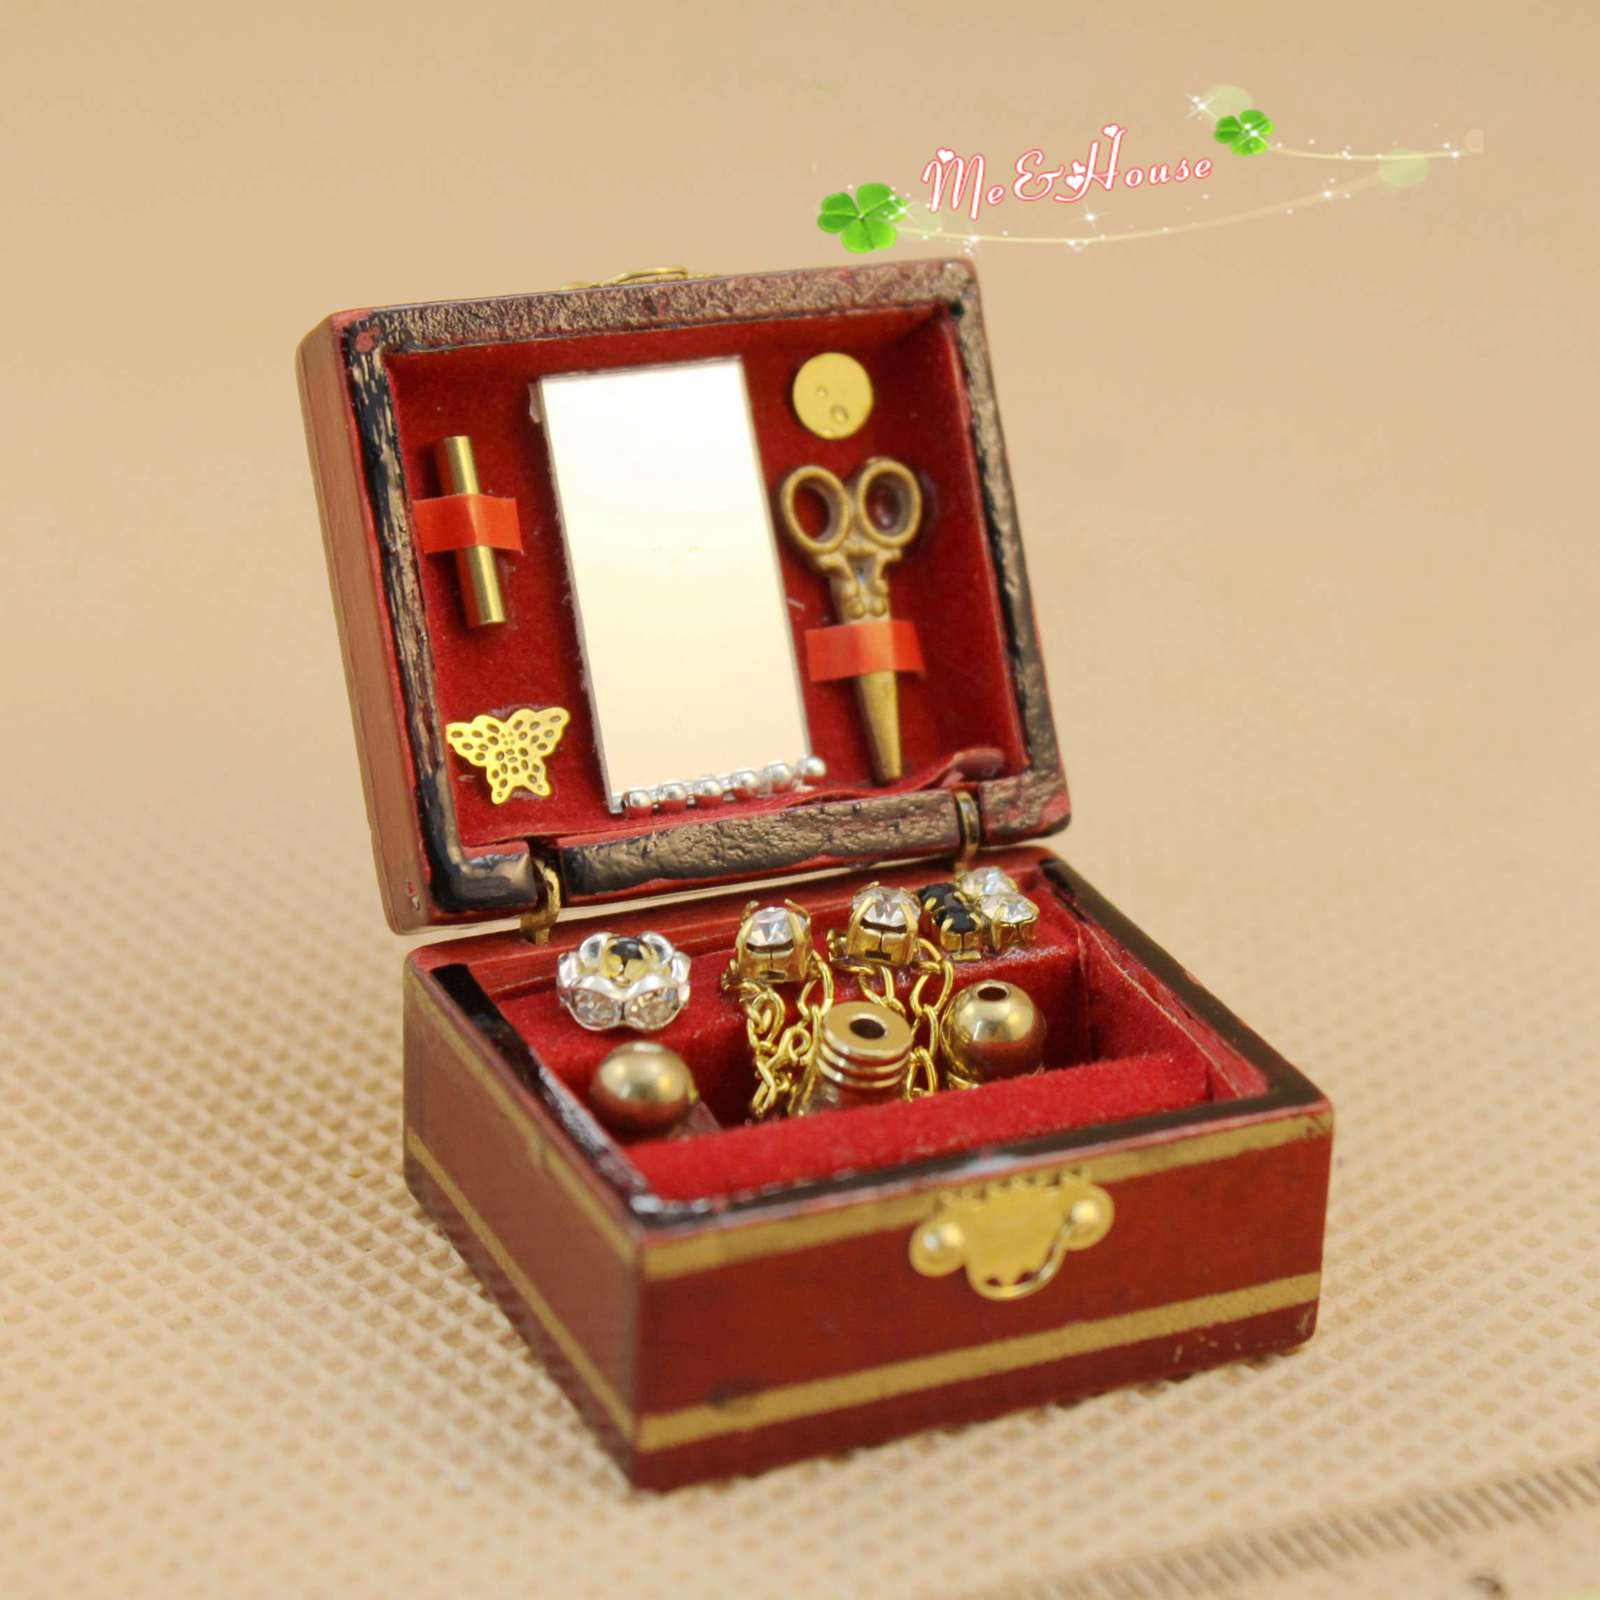 Caja de kit de aguja de costura con aguja Vintage 112 casa de muñecas en miniatura de altura 2,2 CM Accesorios para casa de muñecas mini joyero retro